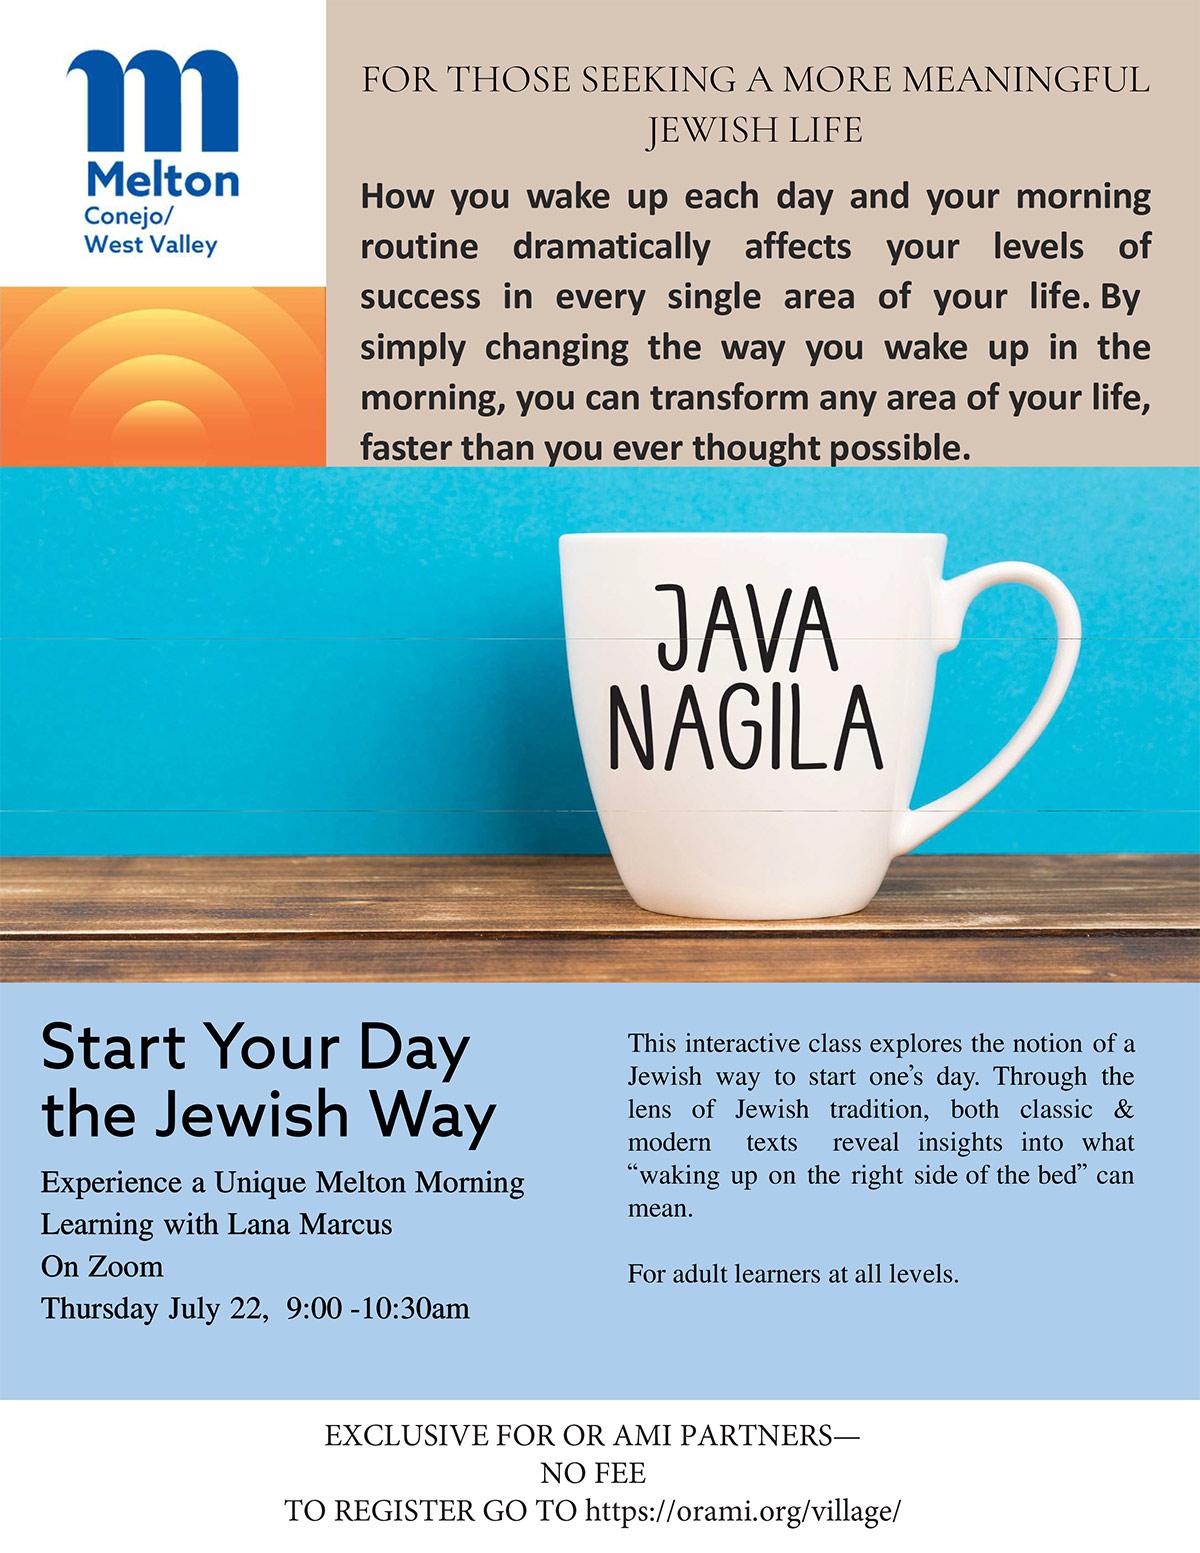 Start Your Day the Jewish Way